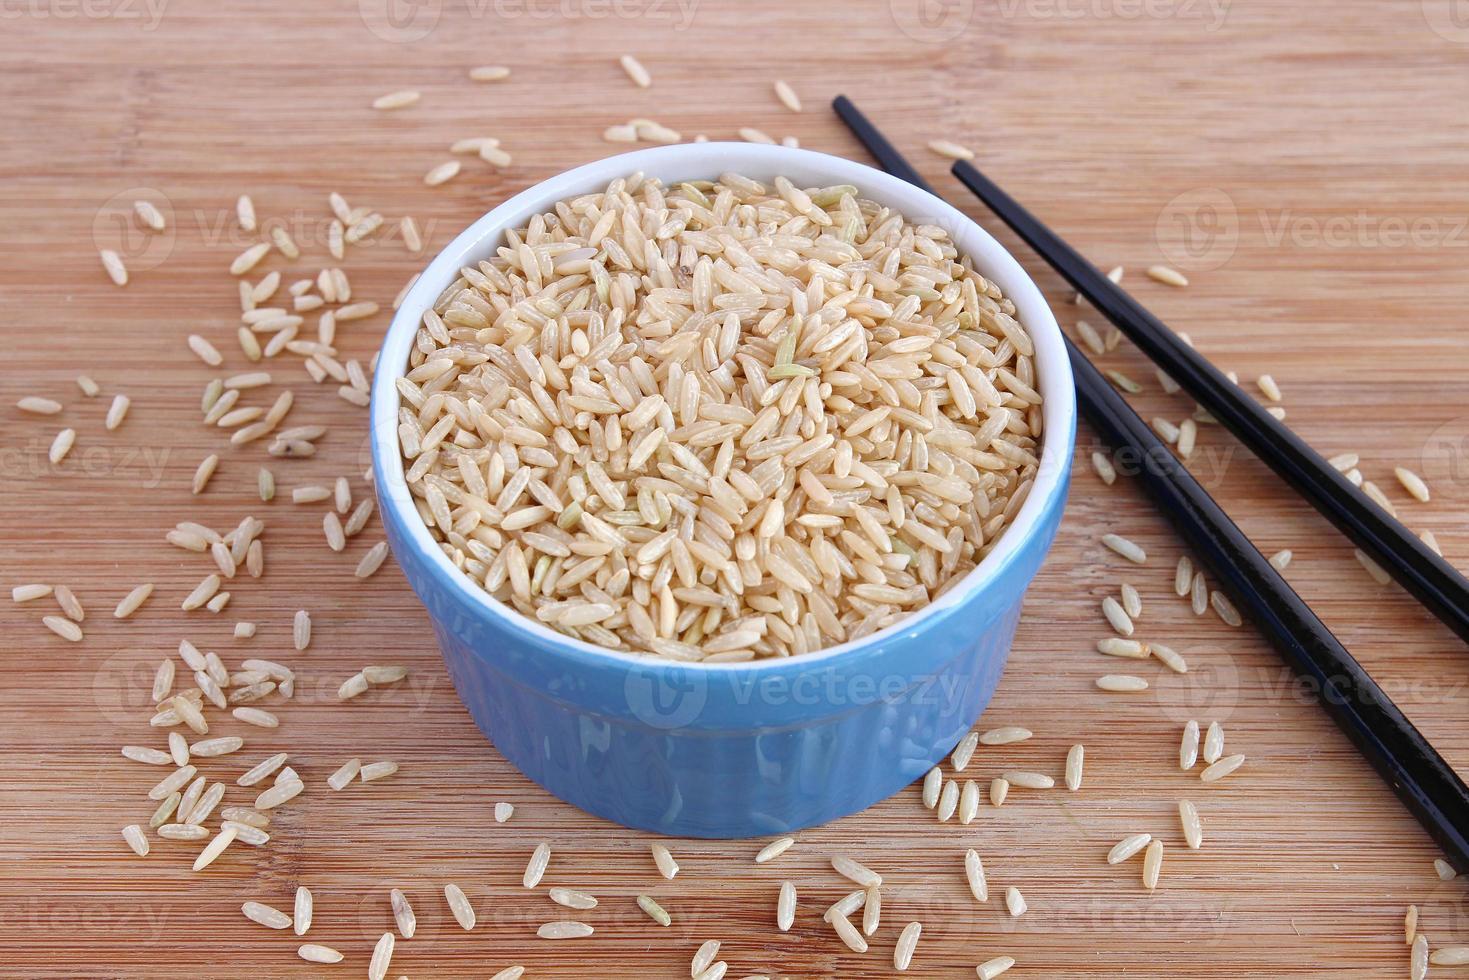 riz brun dans un bol bleu photo